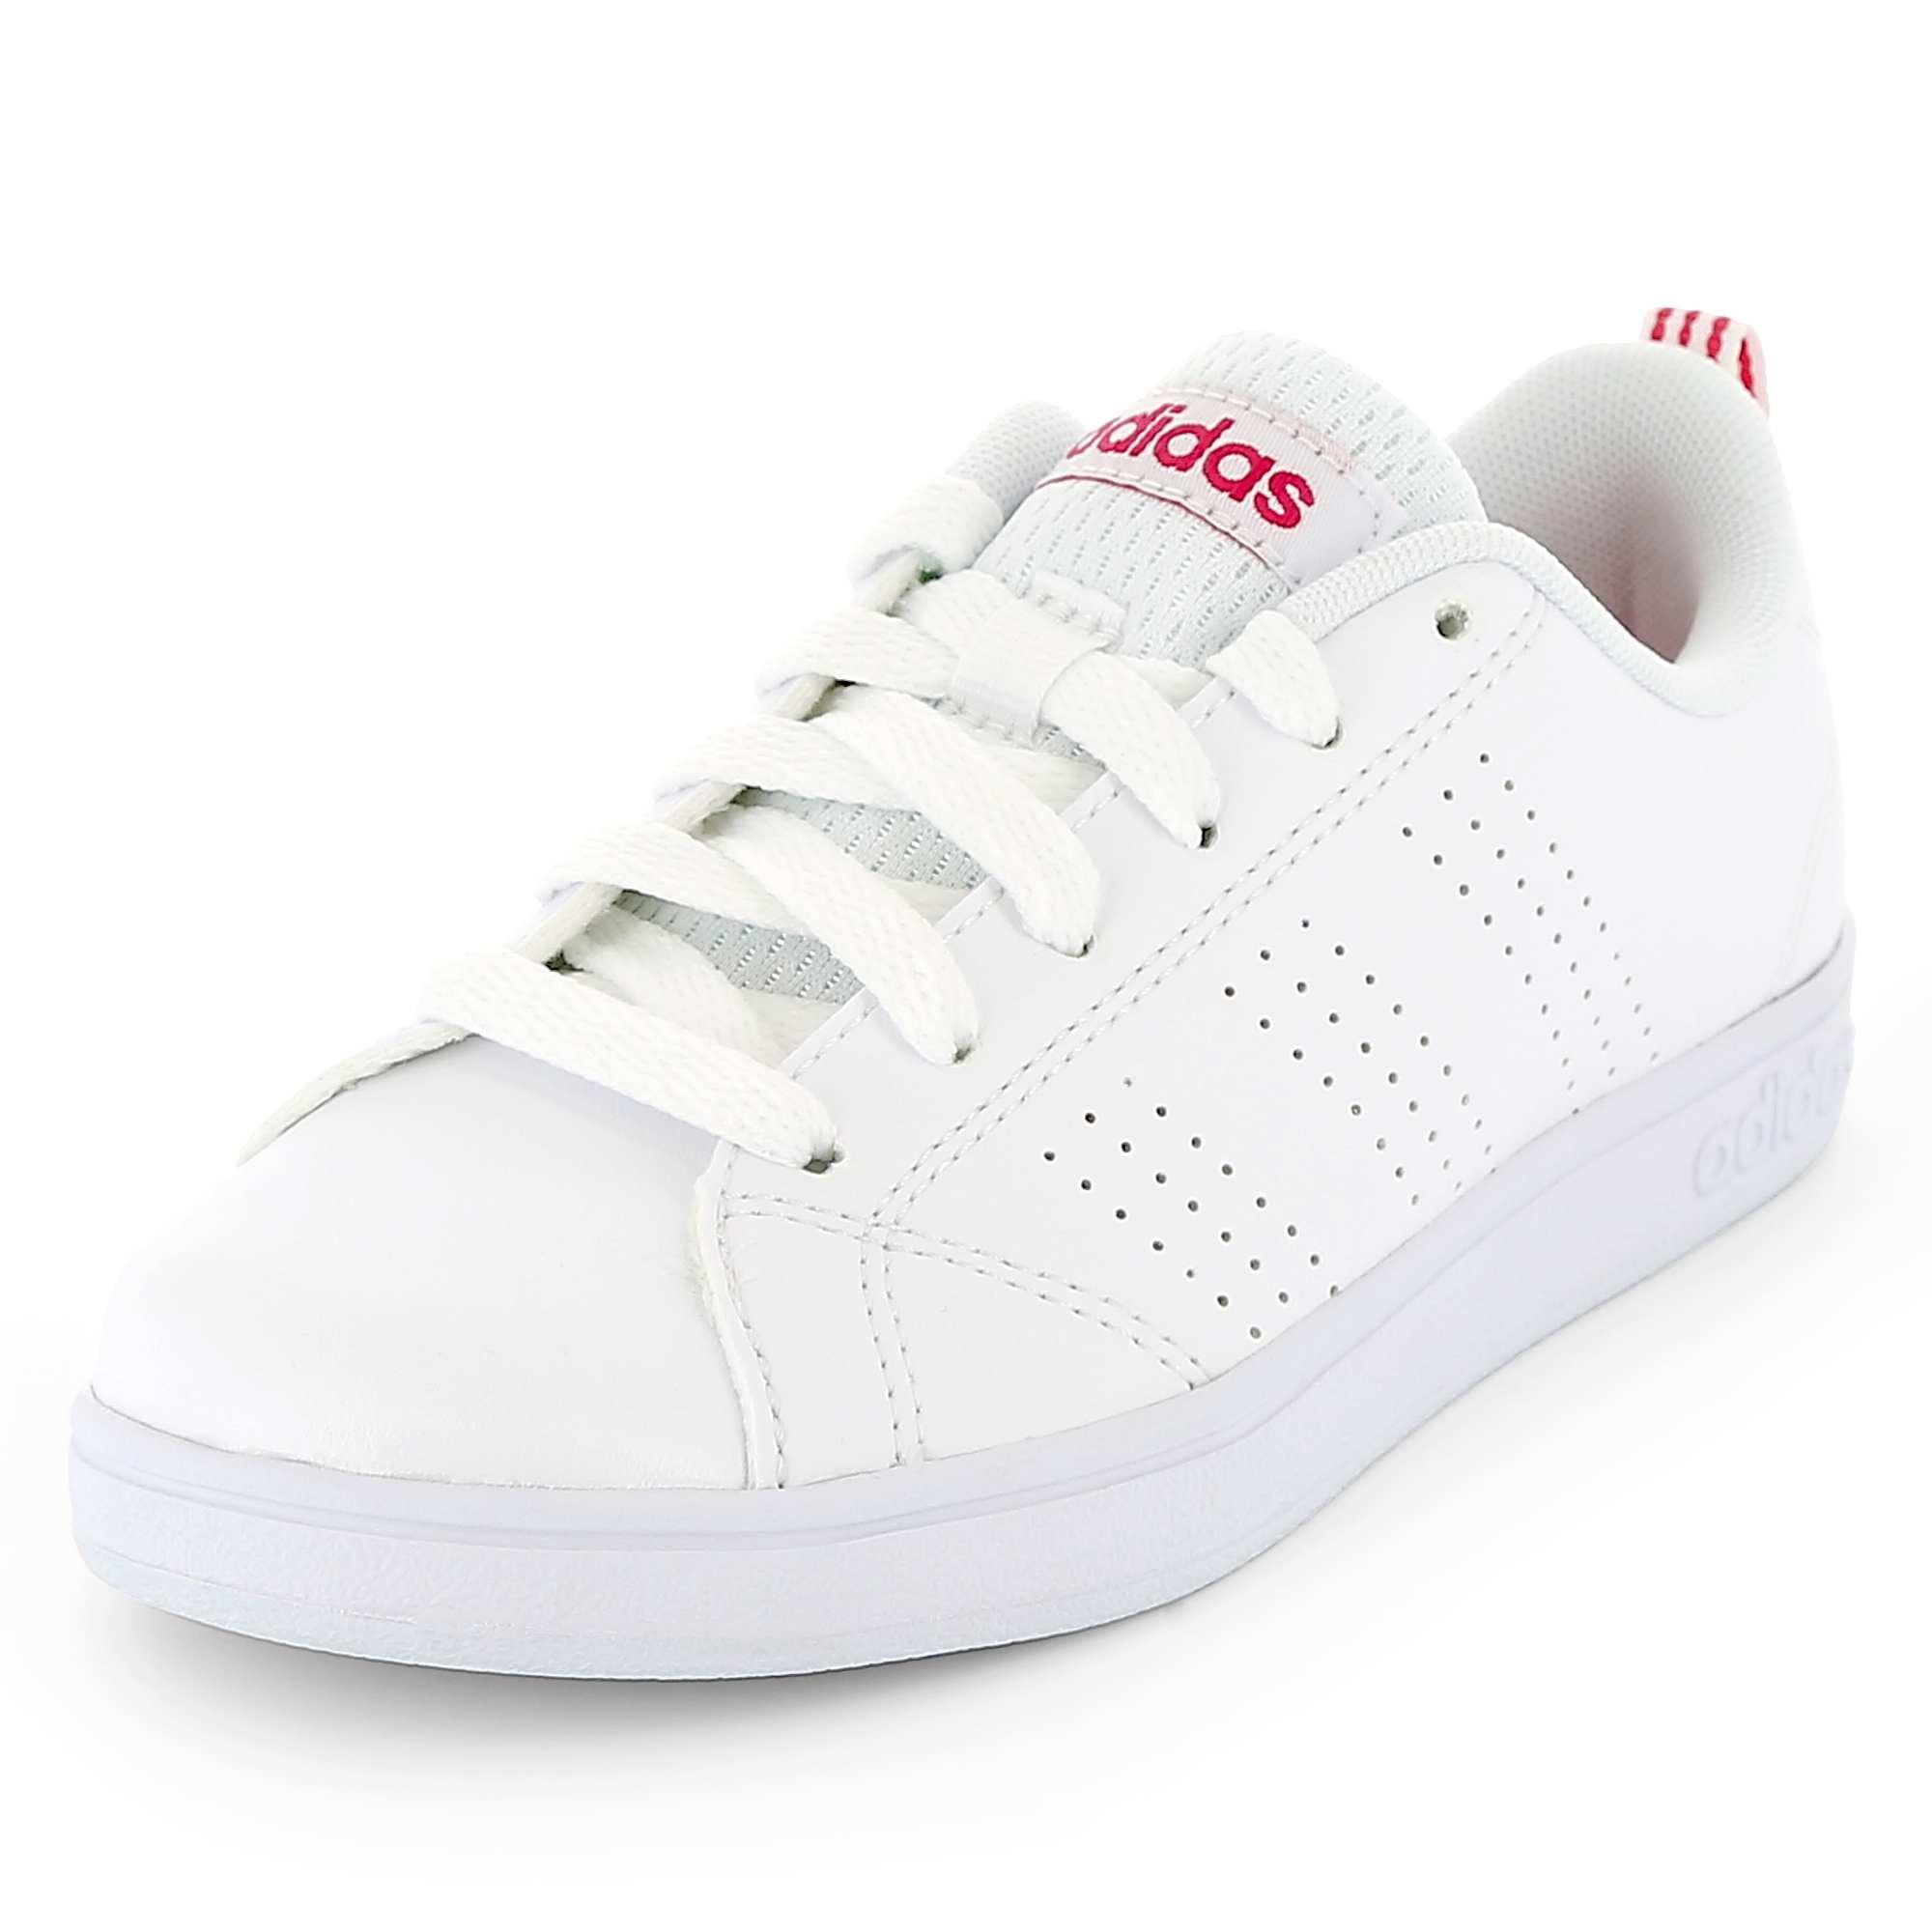 chaussure adidas pour adolescente